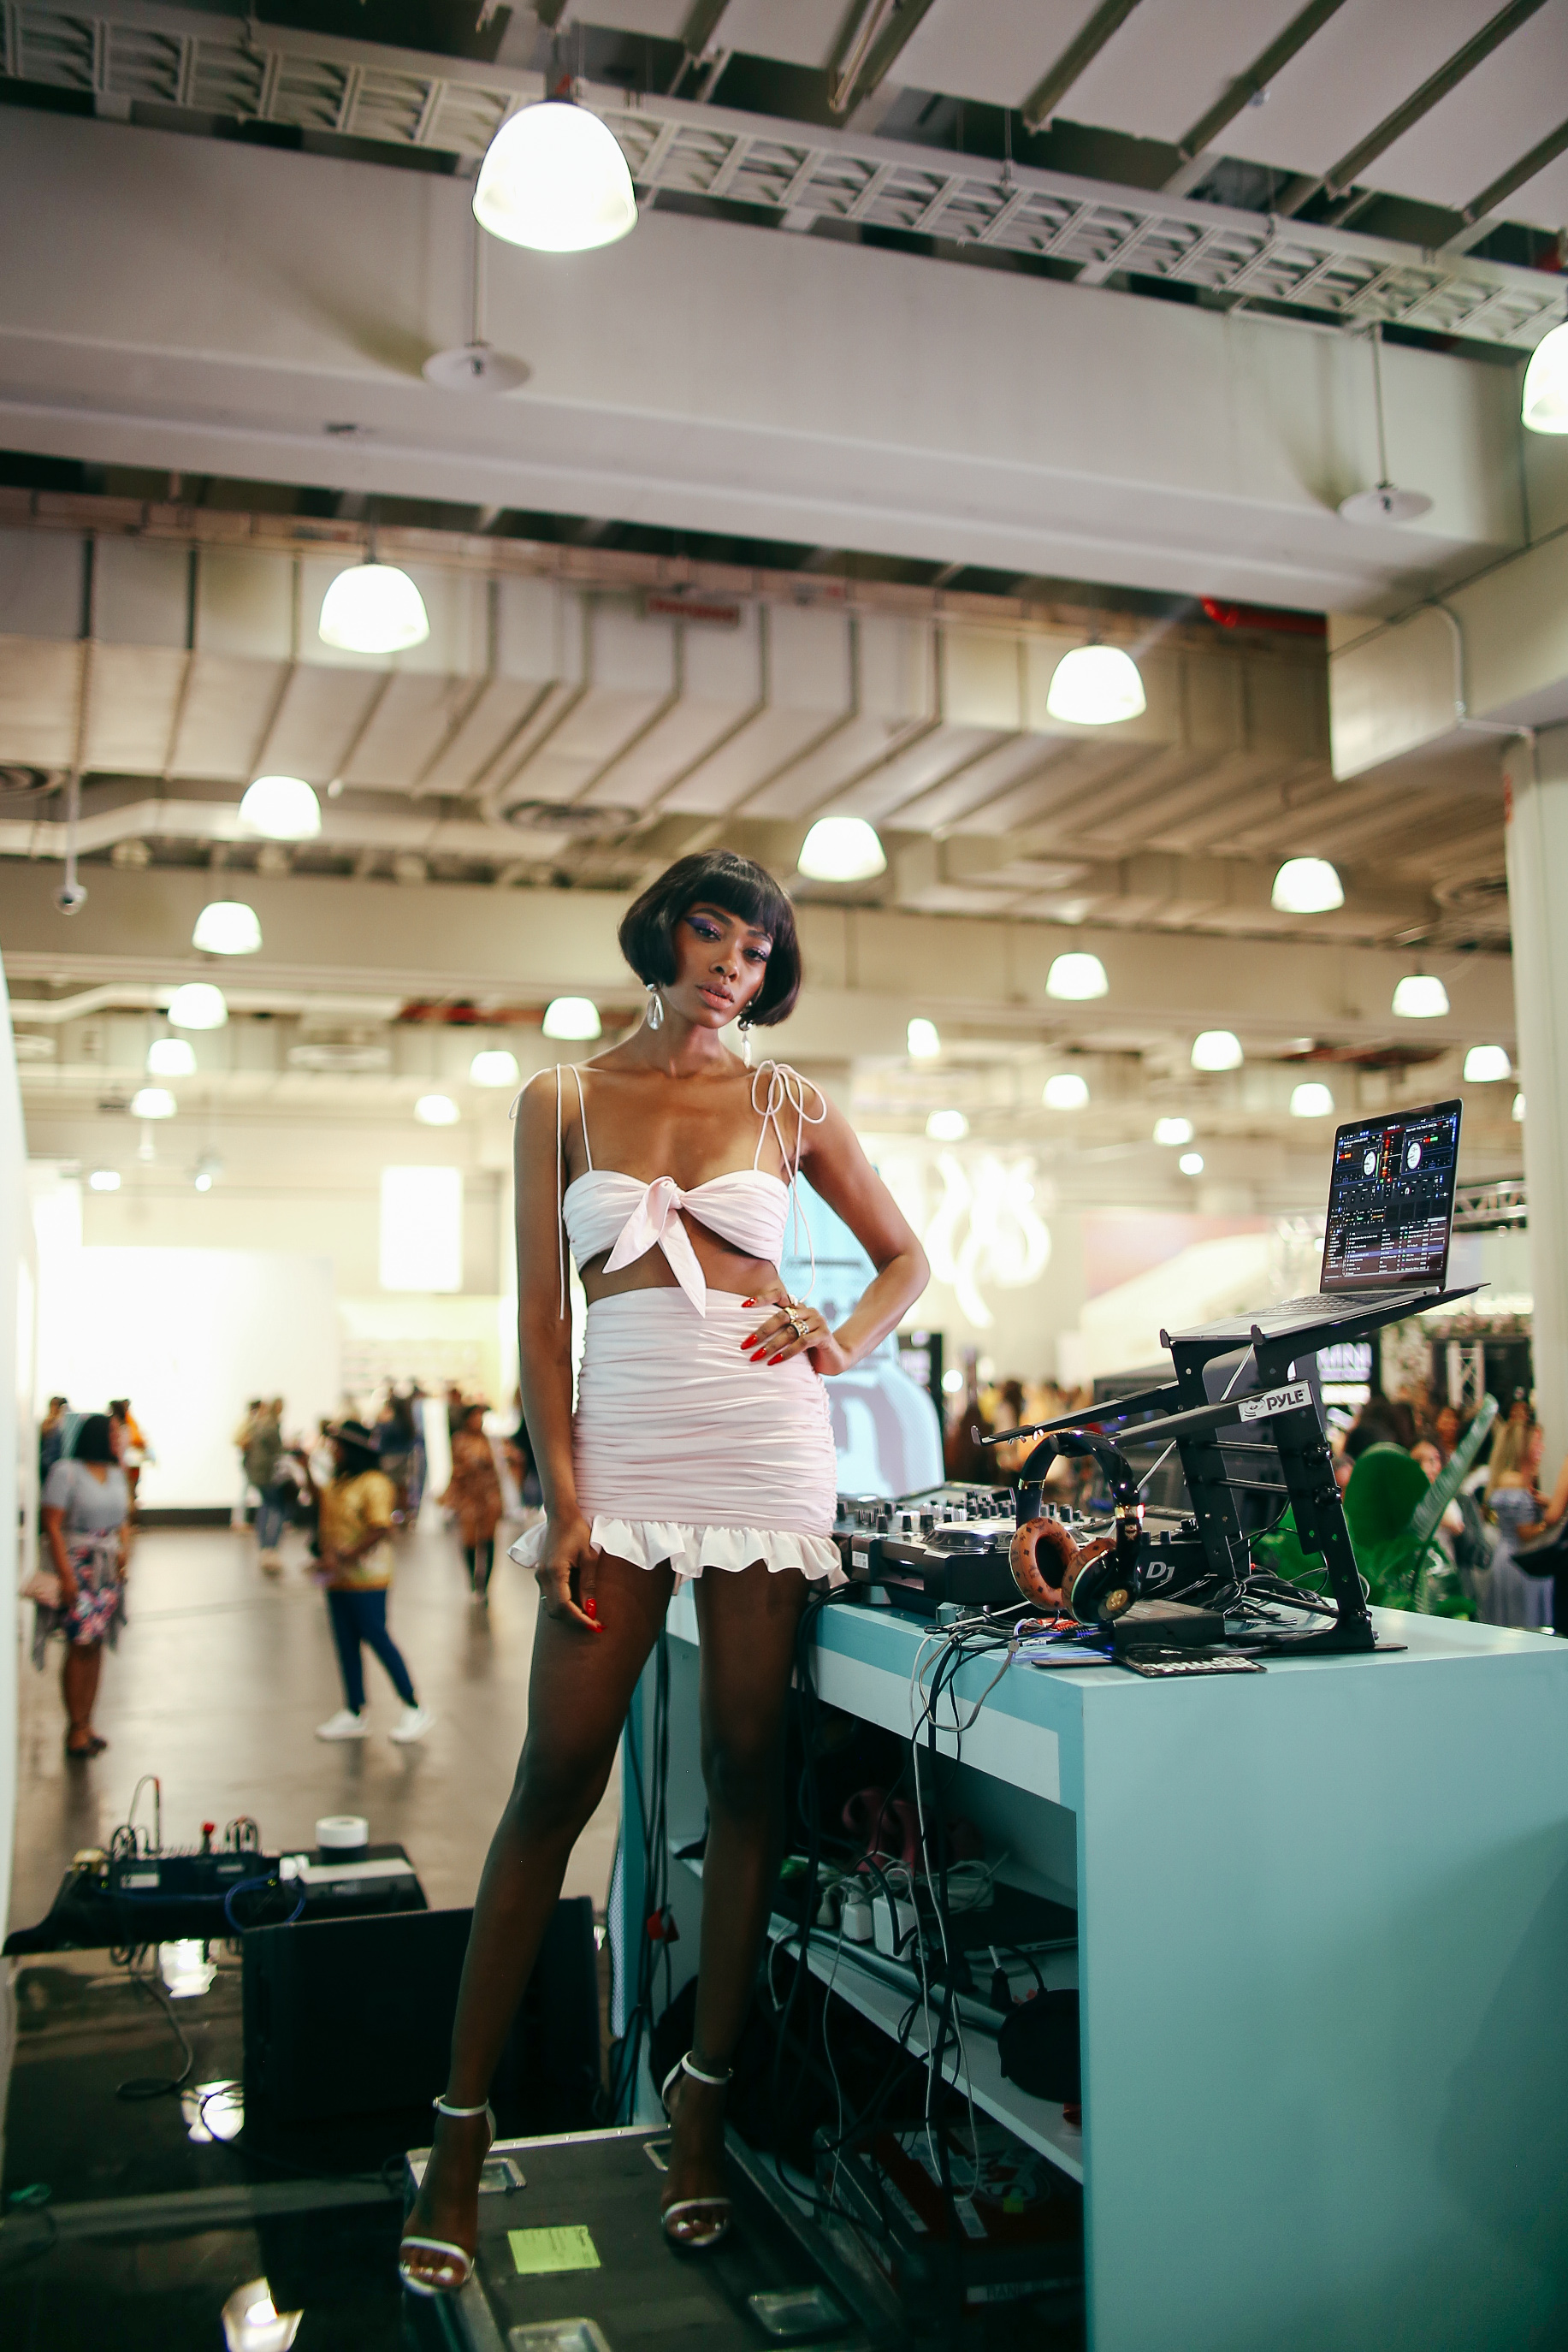 DJ Maad Beautycon NYC Prism DJs 1.JPG